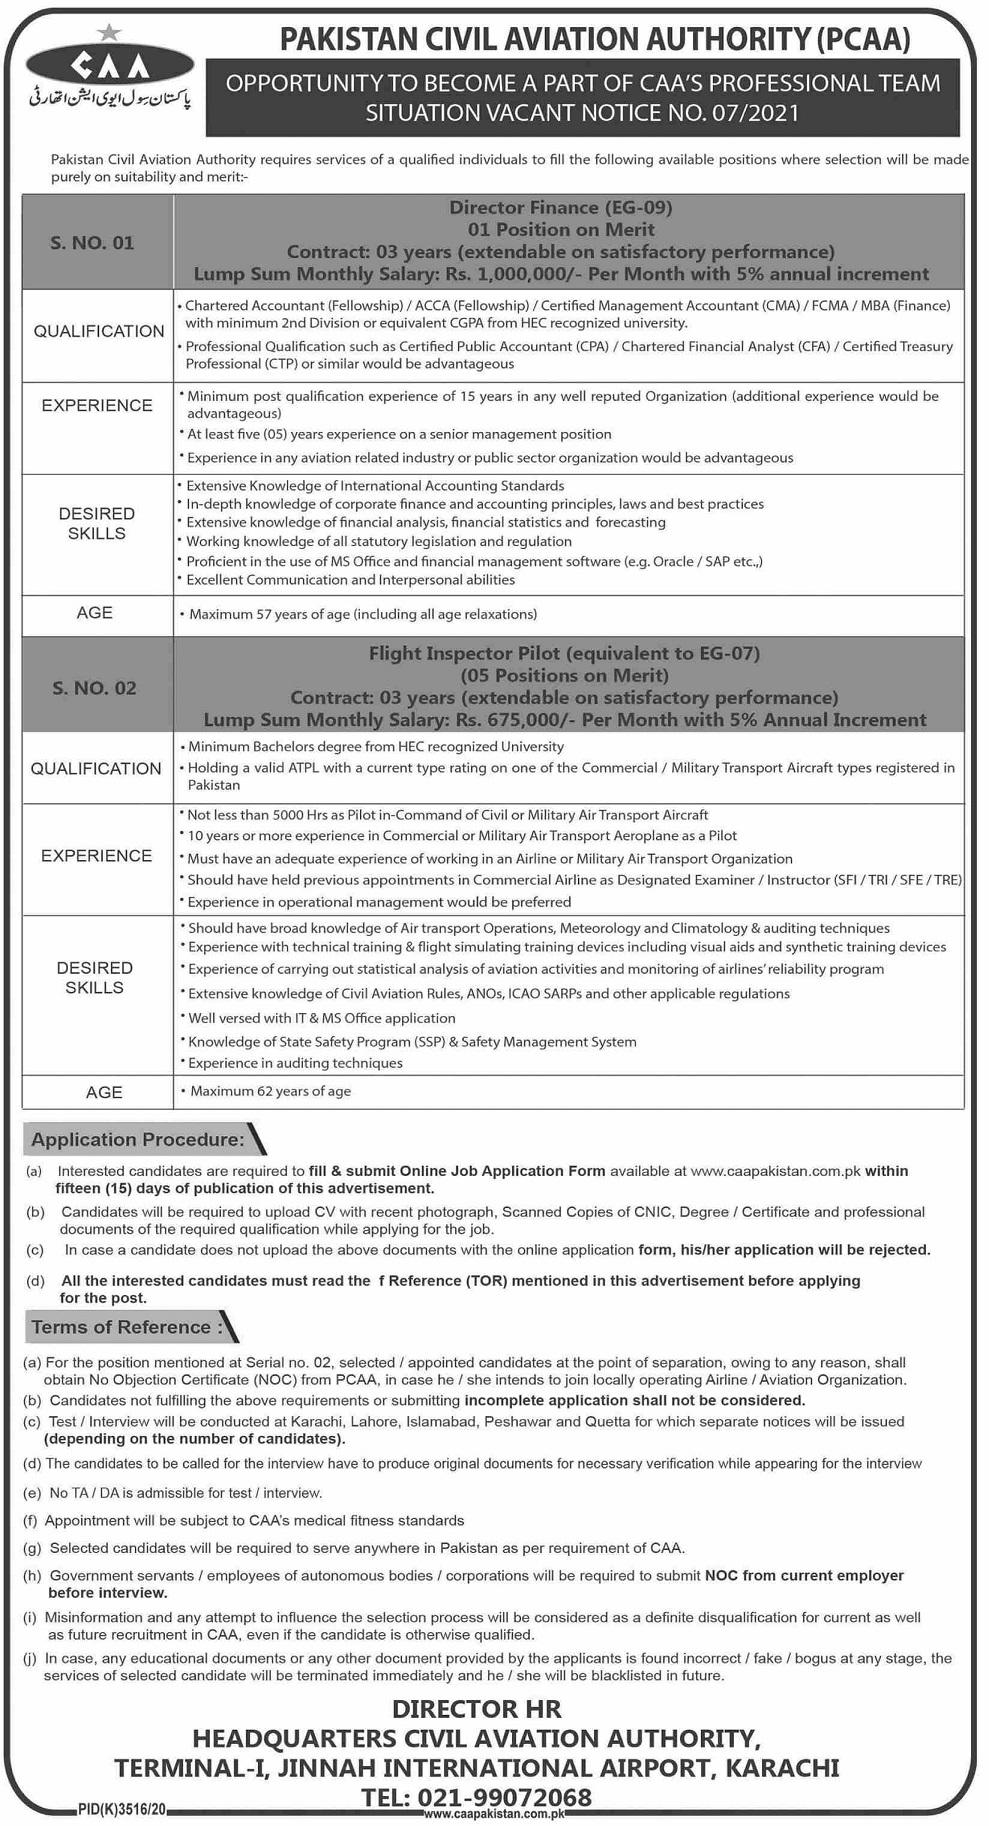 Civil Aviation Authority CAA Jobs Flight Inspector Pilot Patwari Interview Schedule